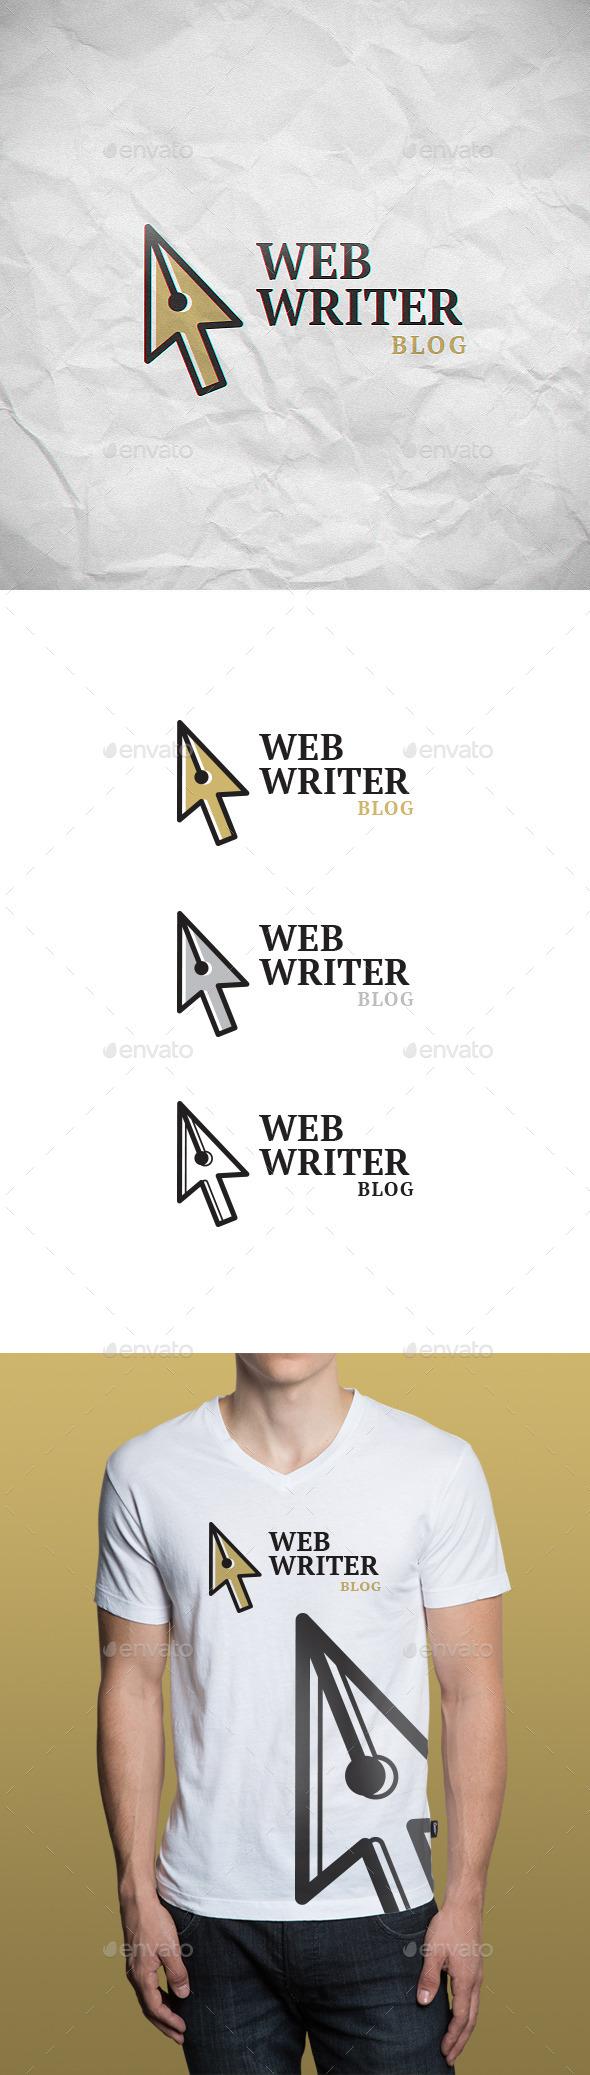 Web Writer Logo Template